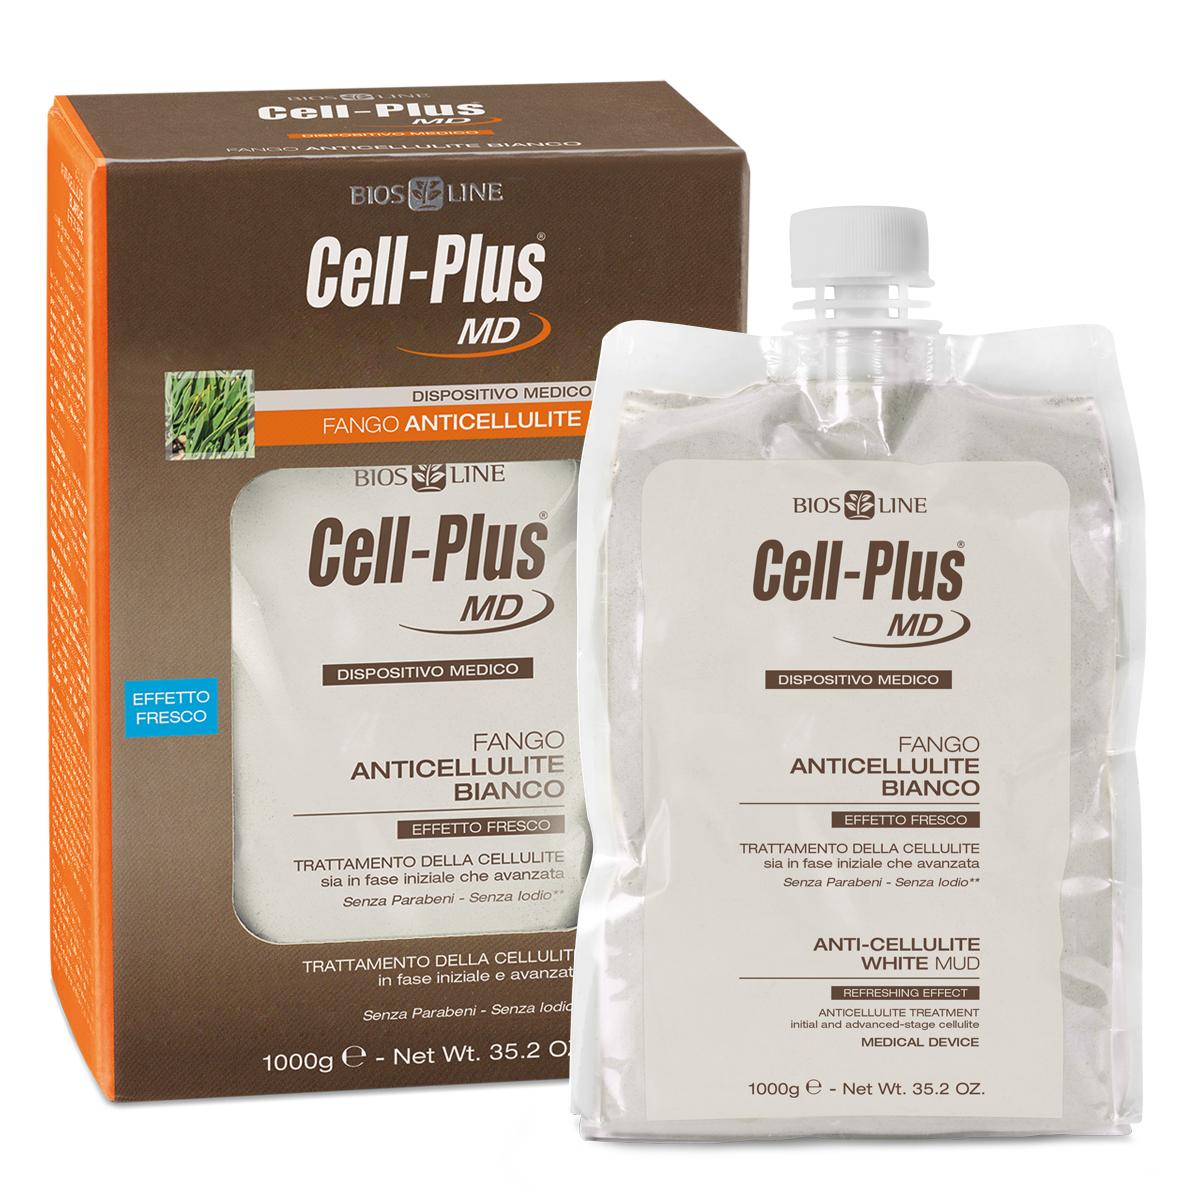 Cell-Plus MD Fango bianco